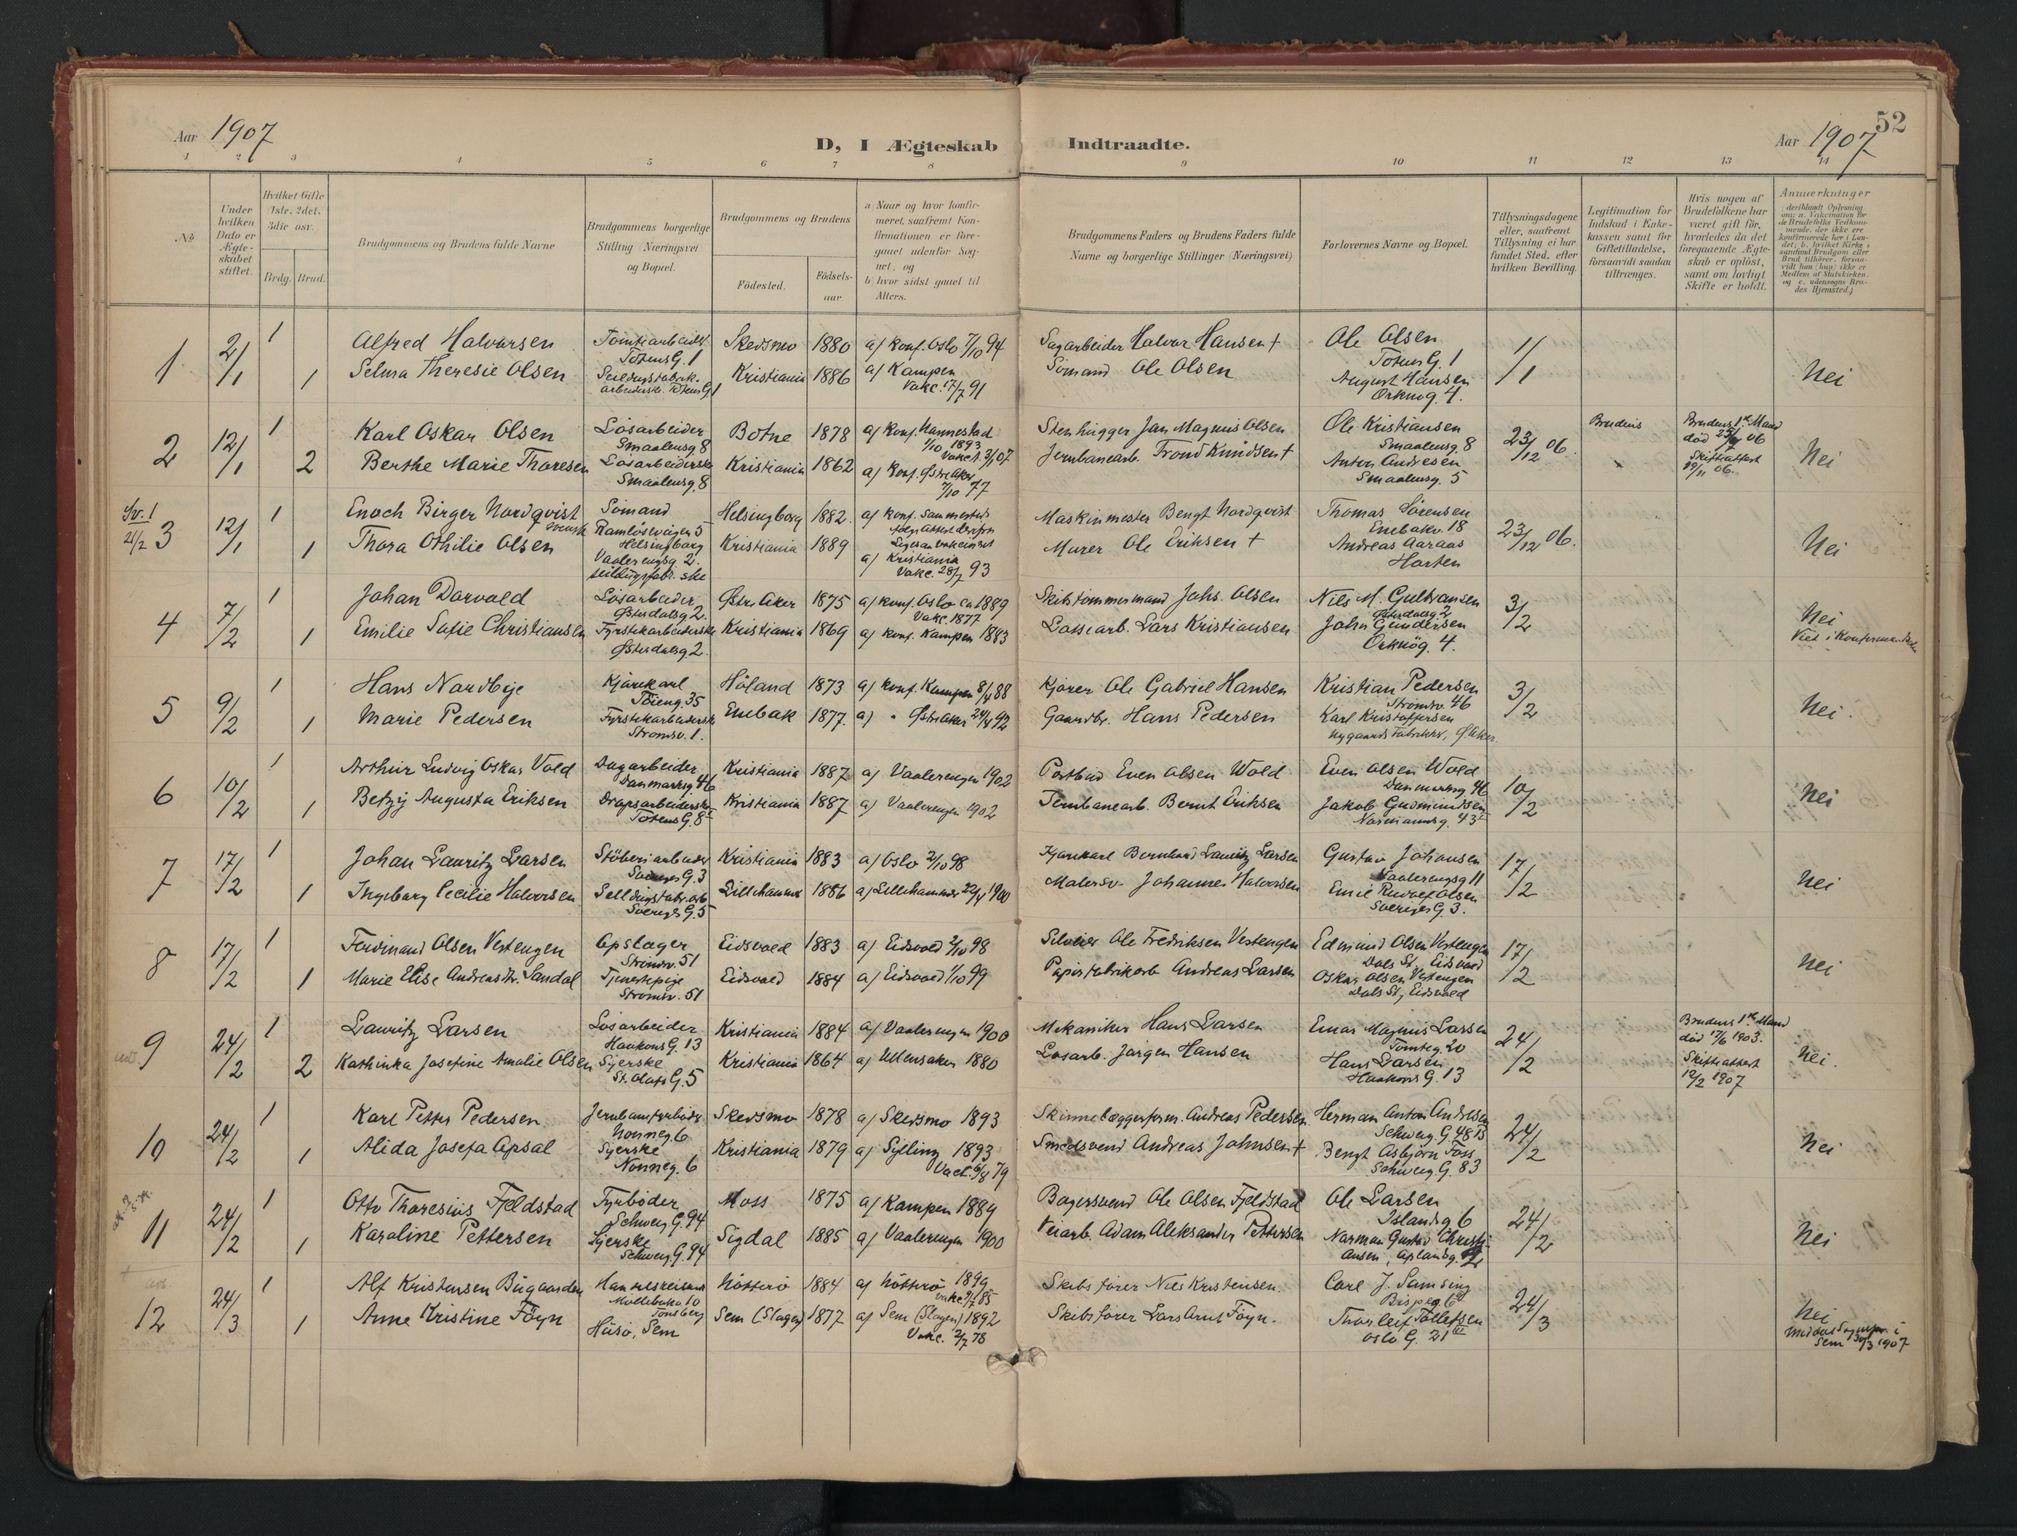 SAO, Vålerengen prestekontor Kirkebøker, F/Fa/L0002: Parish register (official) no. 2, 1899-1924, p. 52